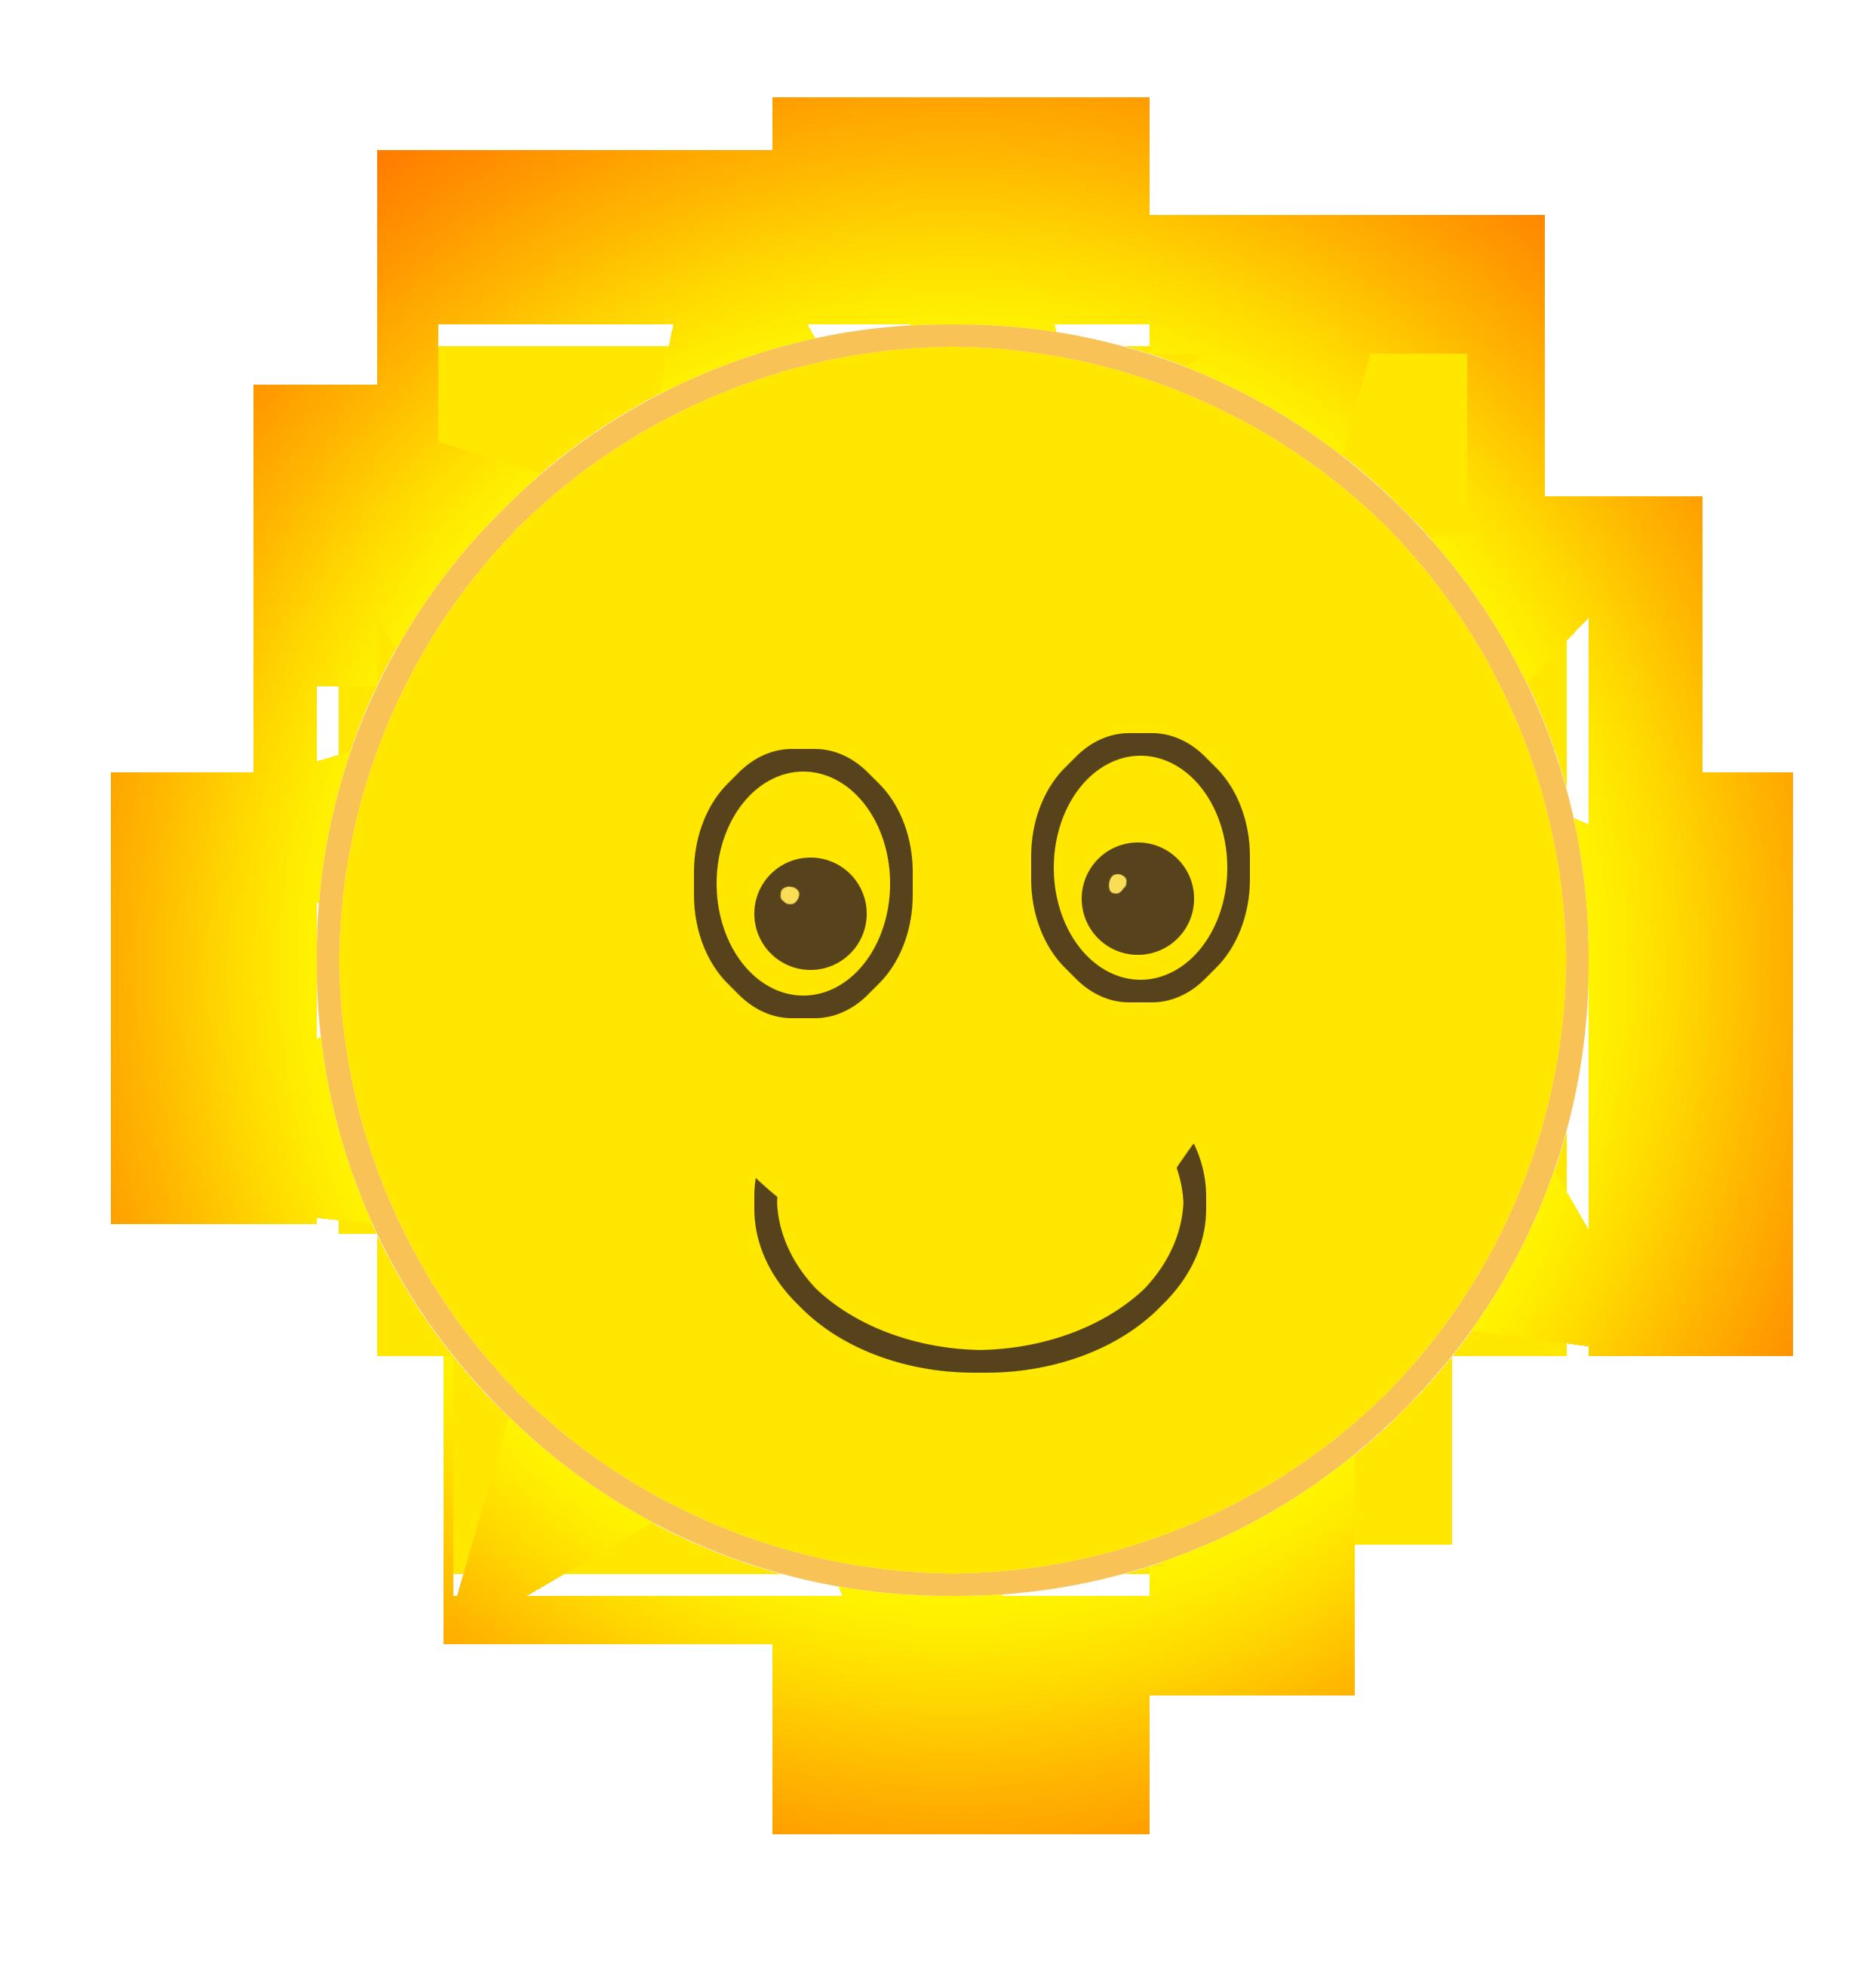 the sun cartoonish